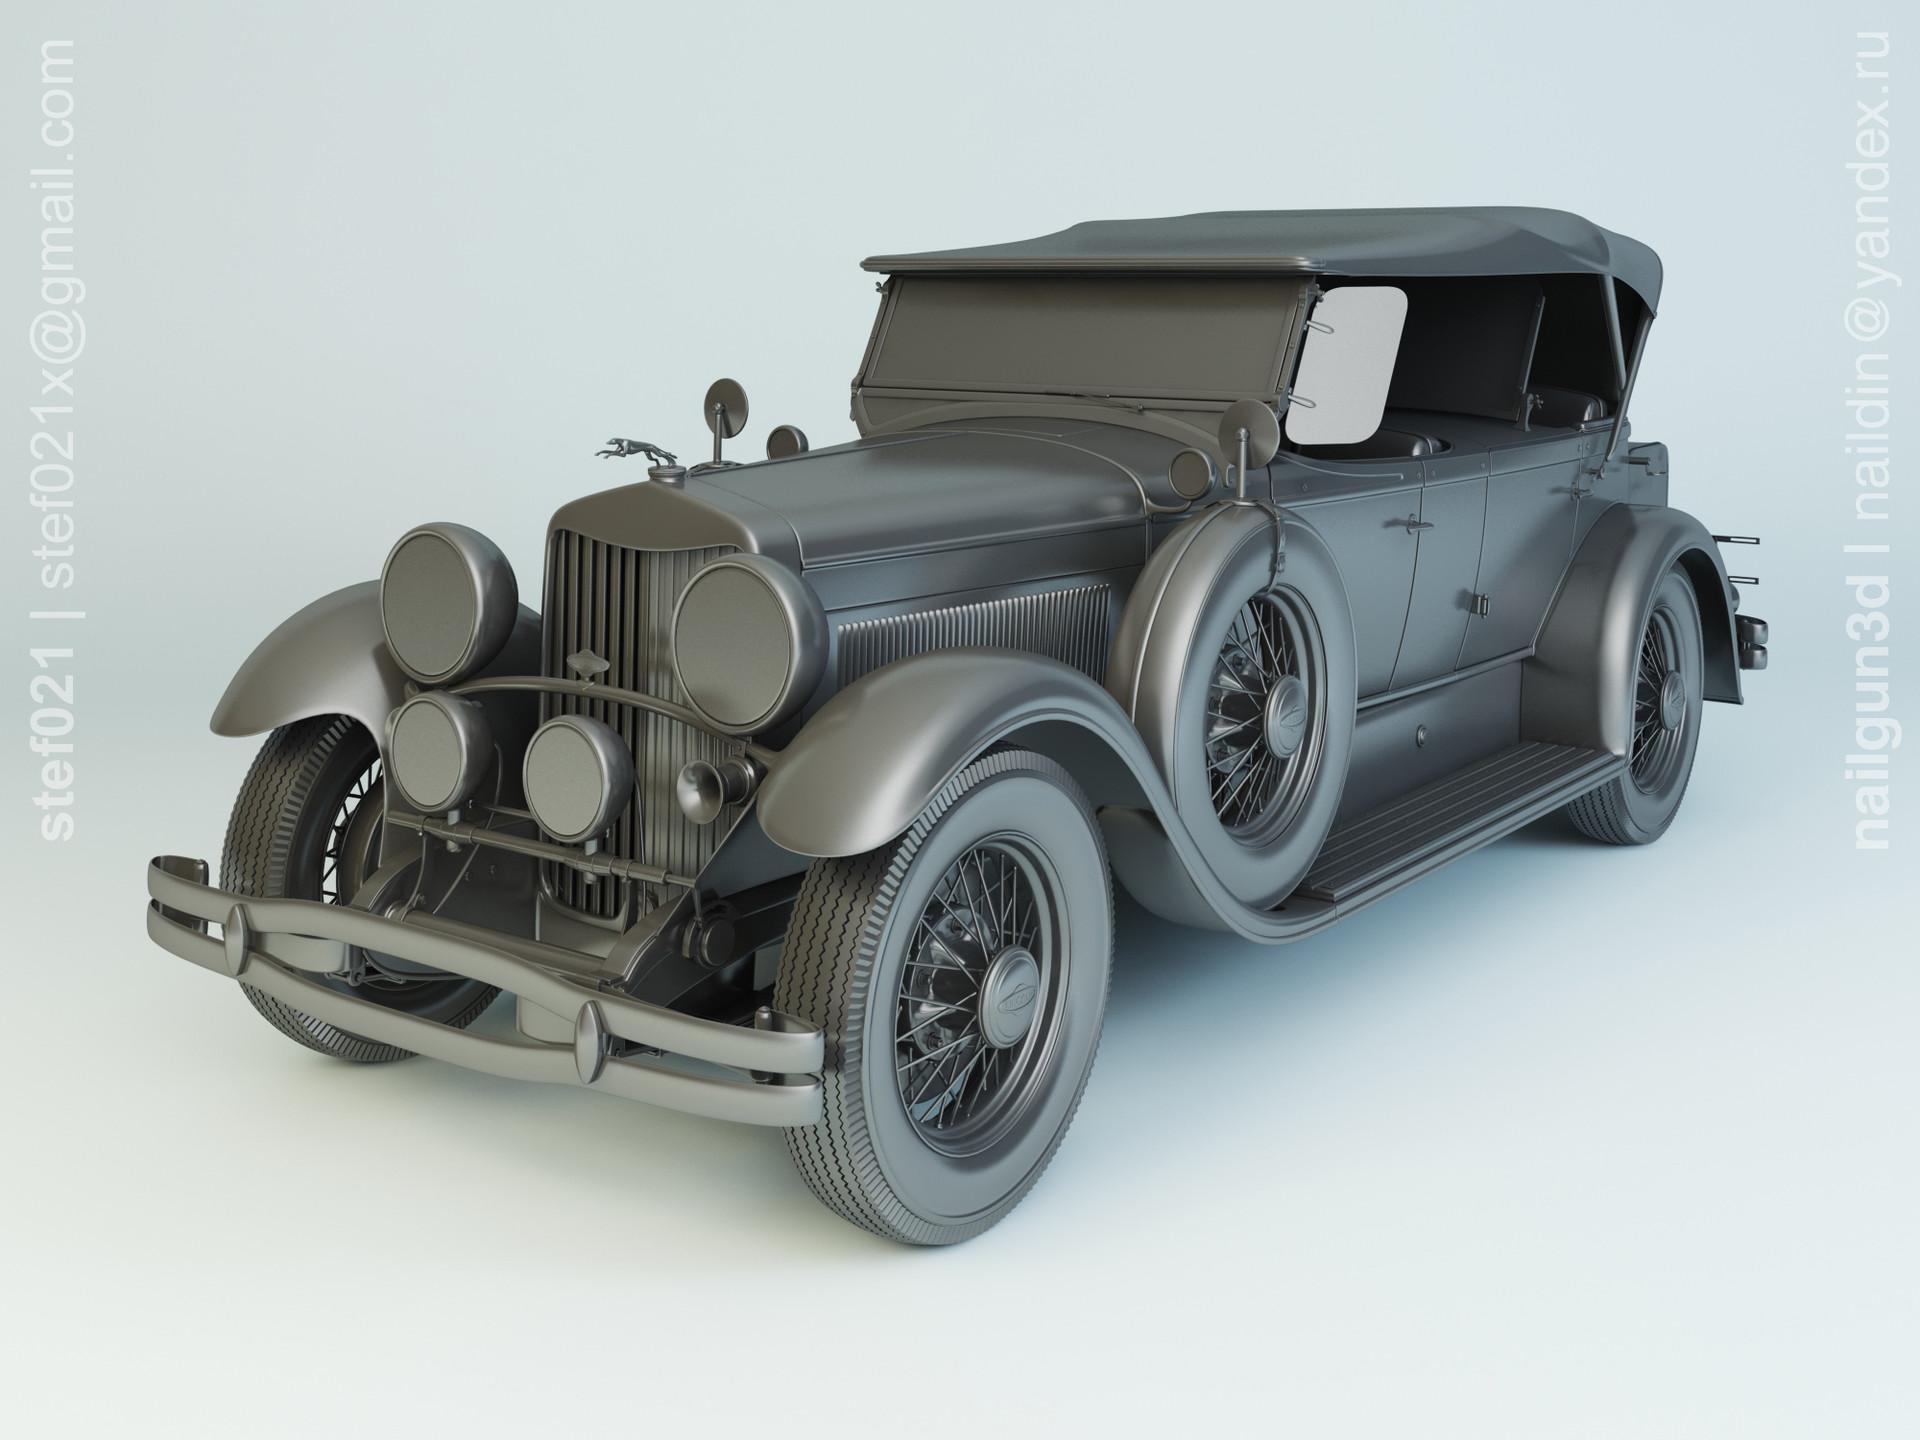 Nail khusnutdinov a0012 000 lincoln molel l 1930 modelling 0